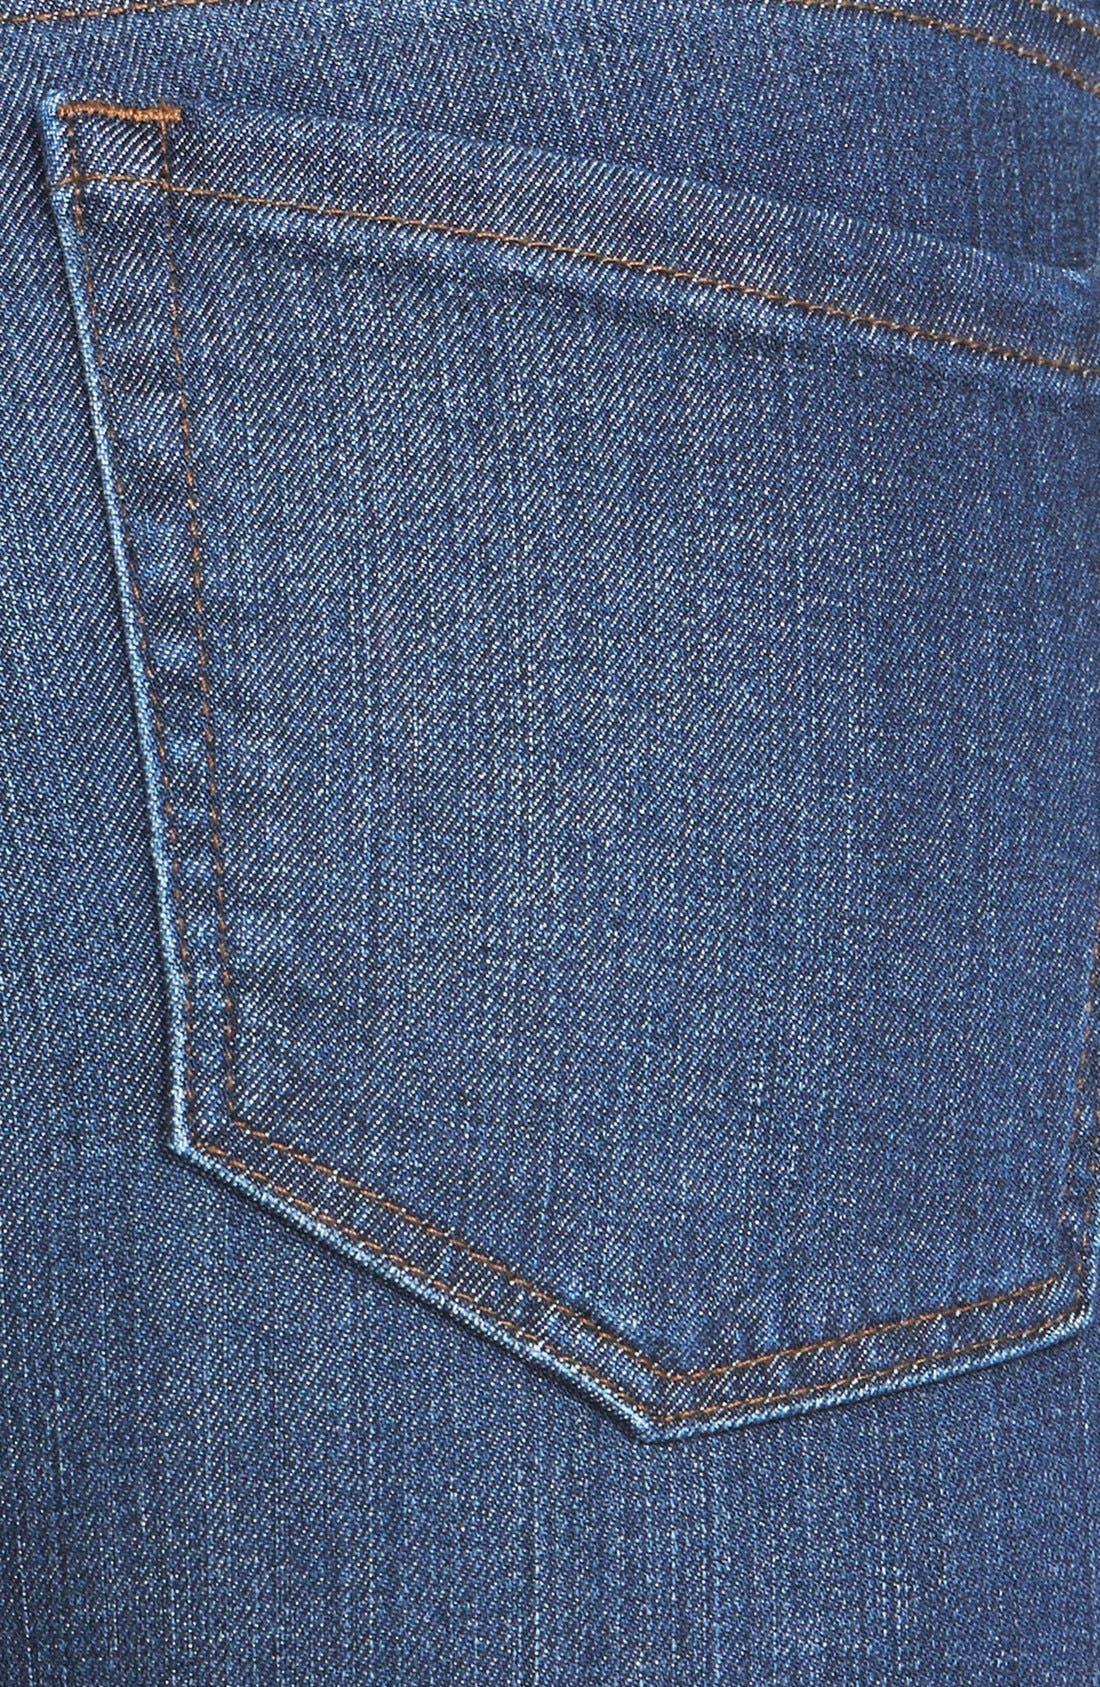 Alternate Image 3  - !iT Collective 'Lauren' Stretch Skinny Jeans (Blue Velvet)